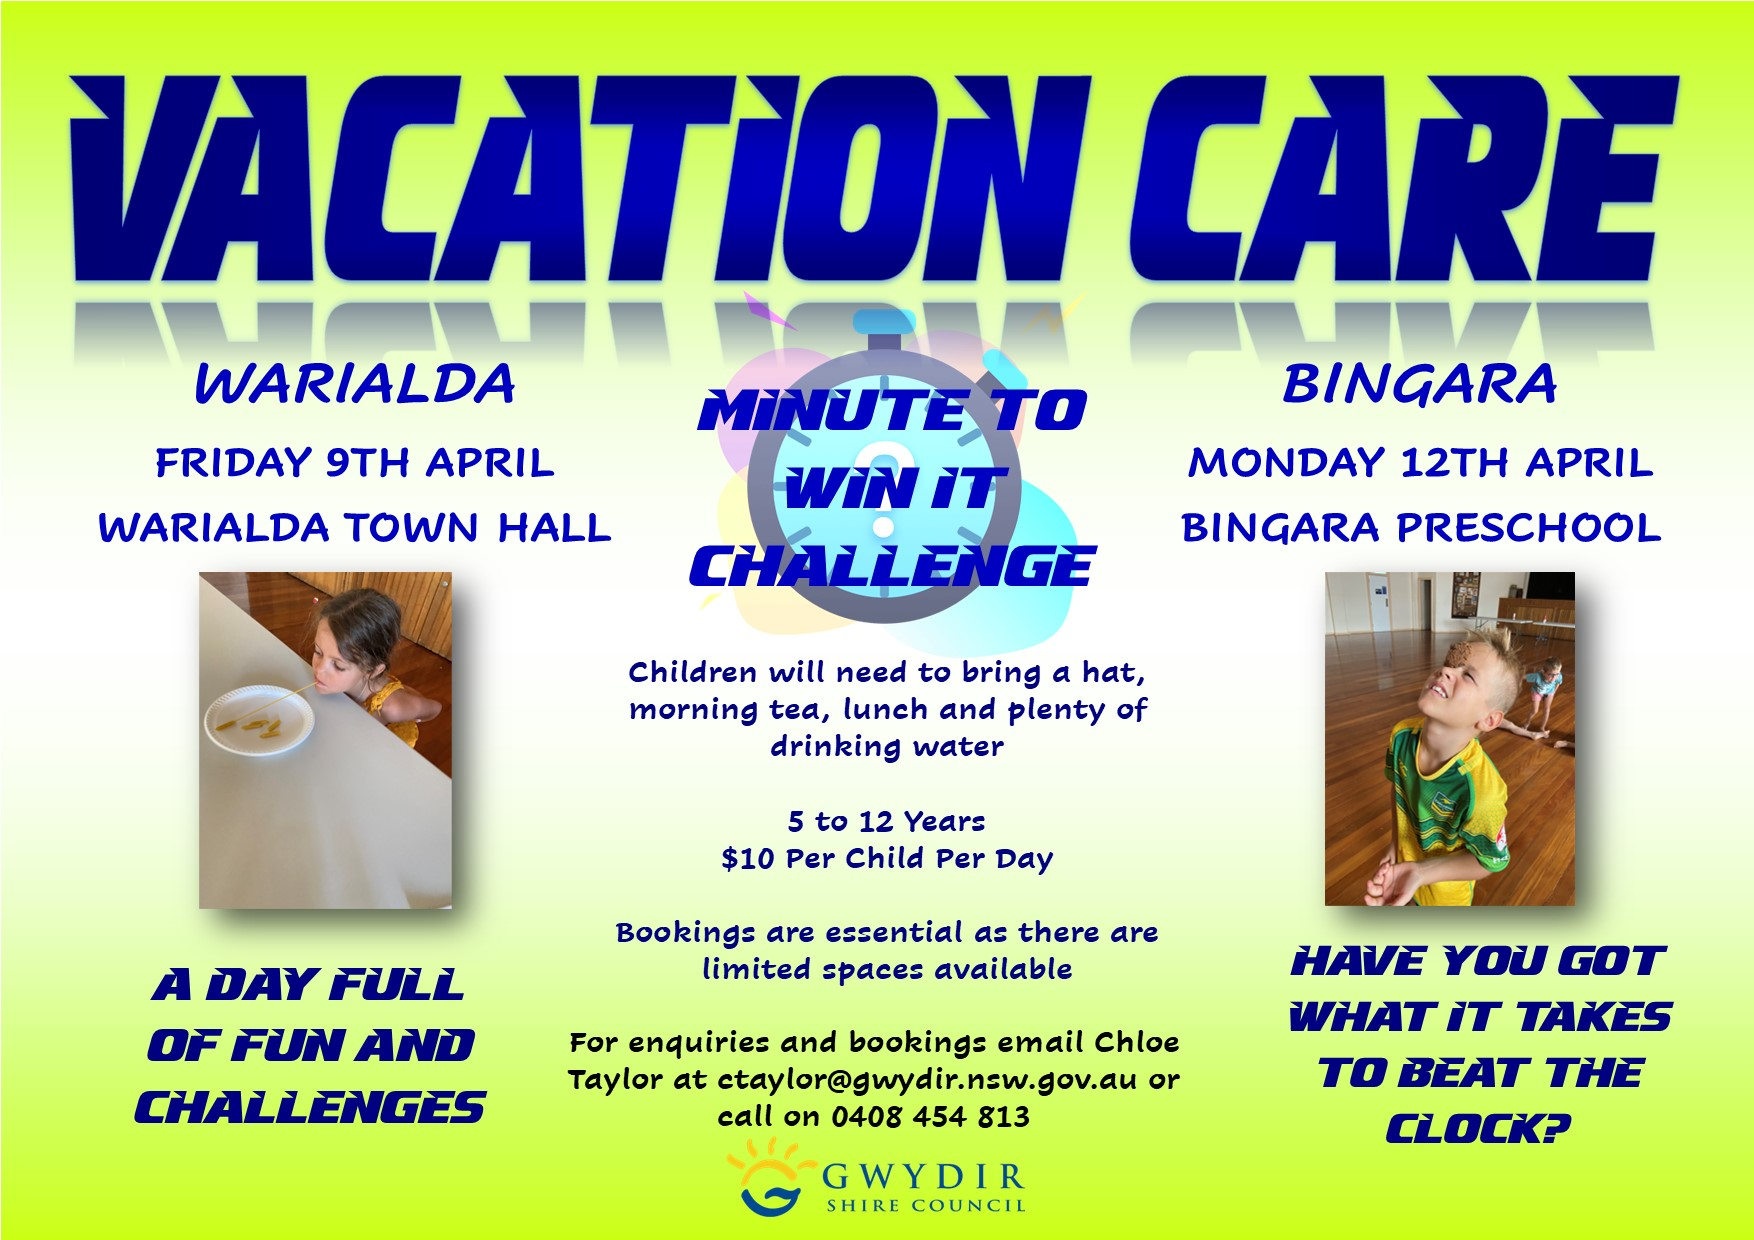 Bingara & Warialda Vacation Care